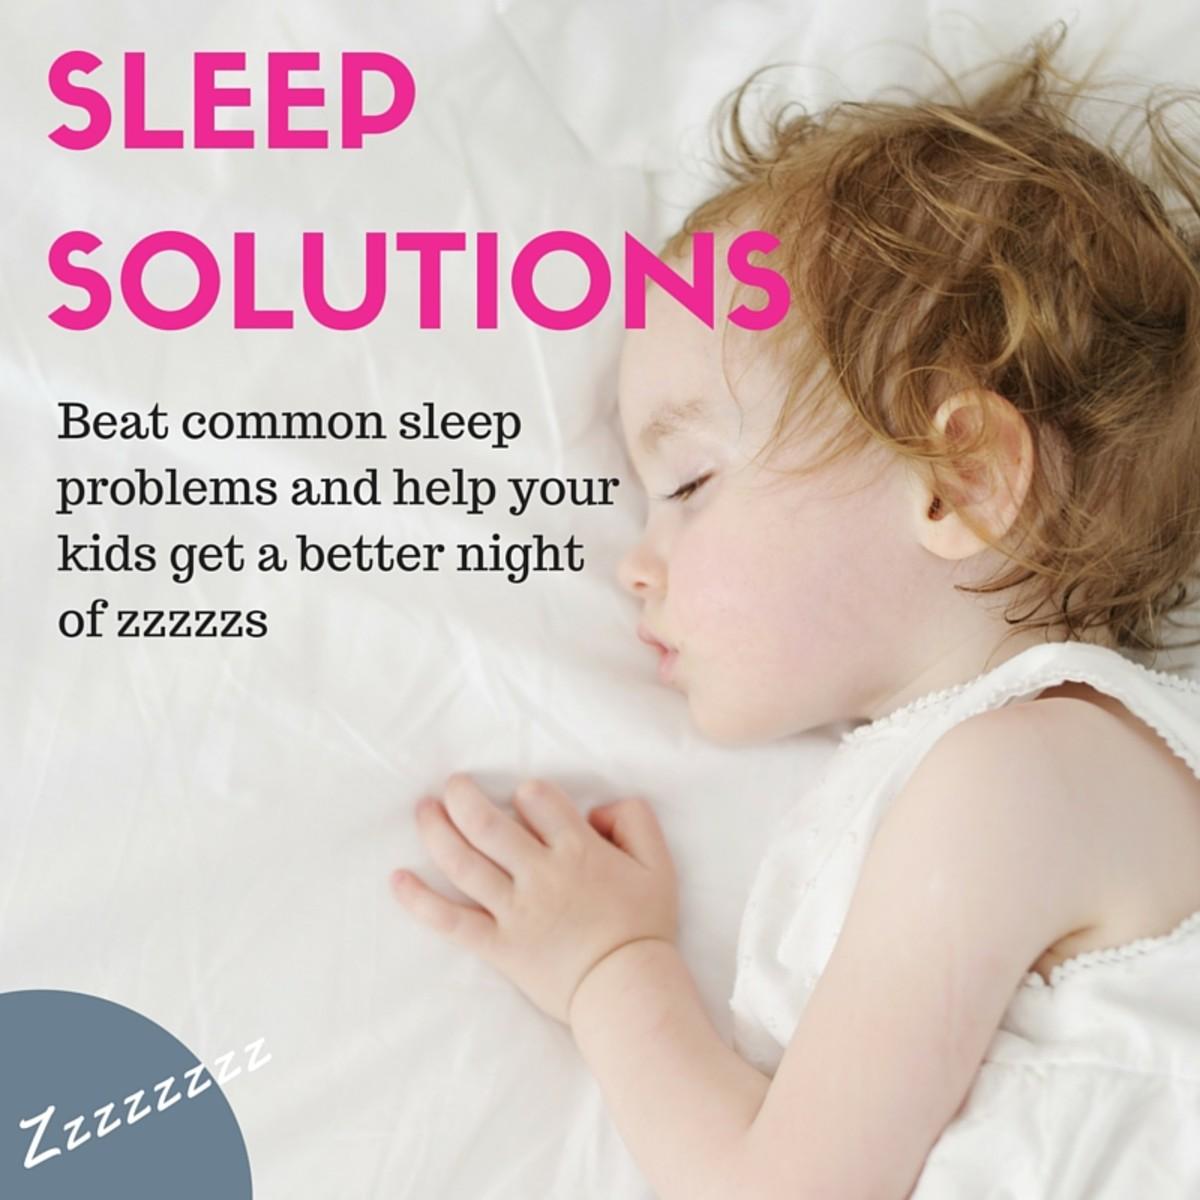 DEALING WITH KID SLEEP WOES